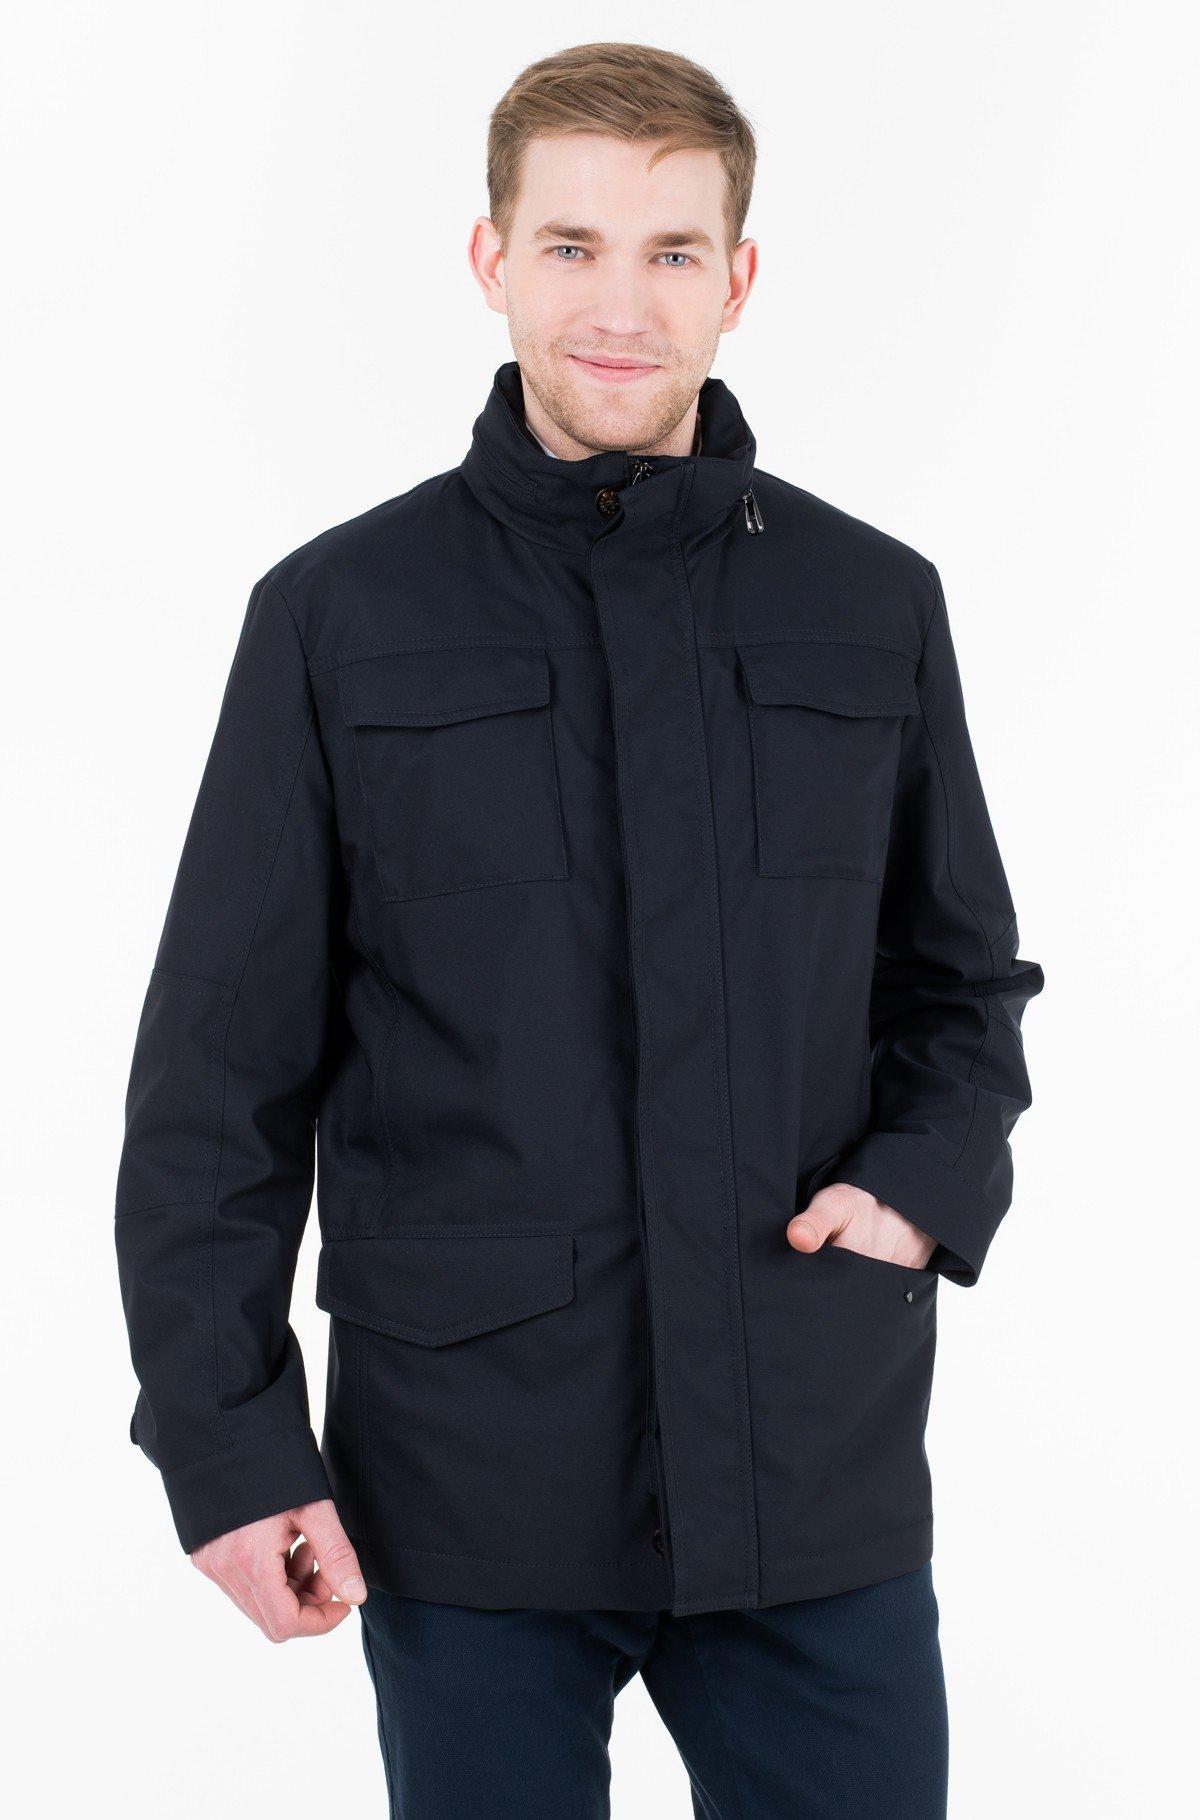 Jacket 4473-68930-full-1